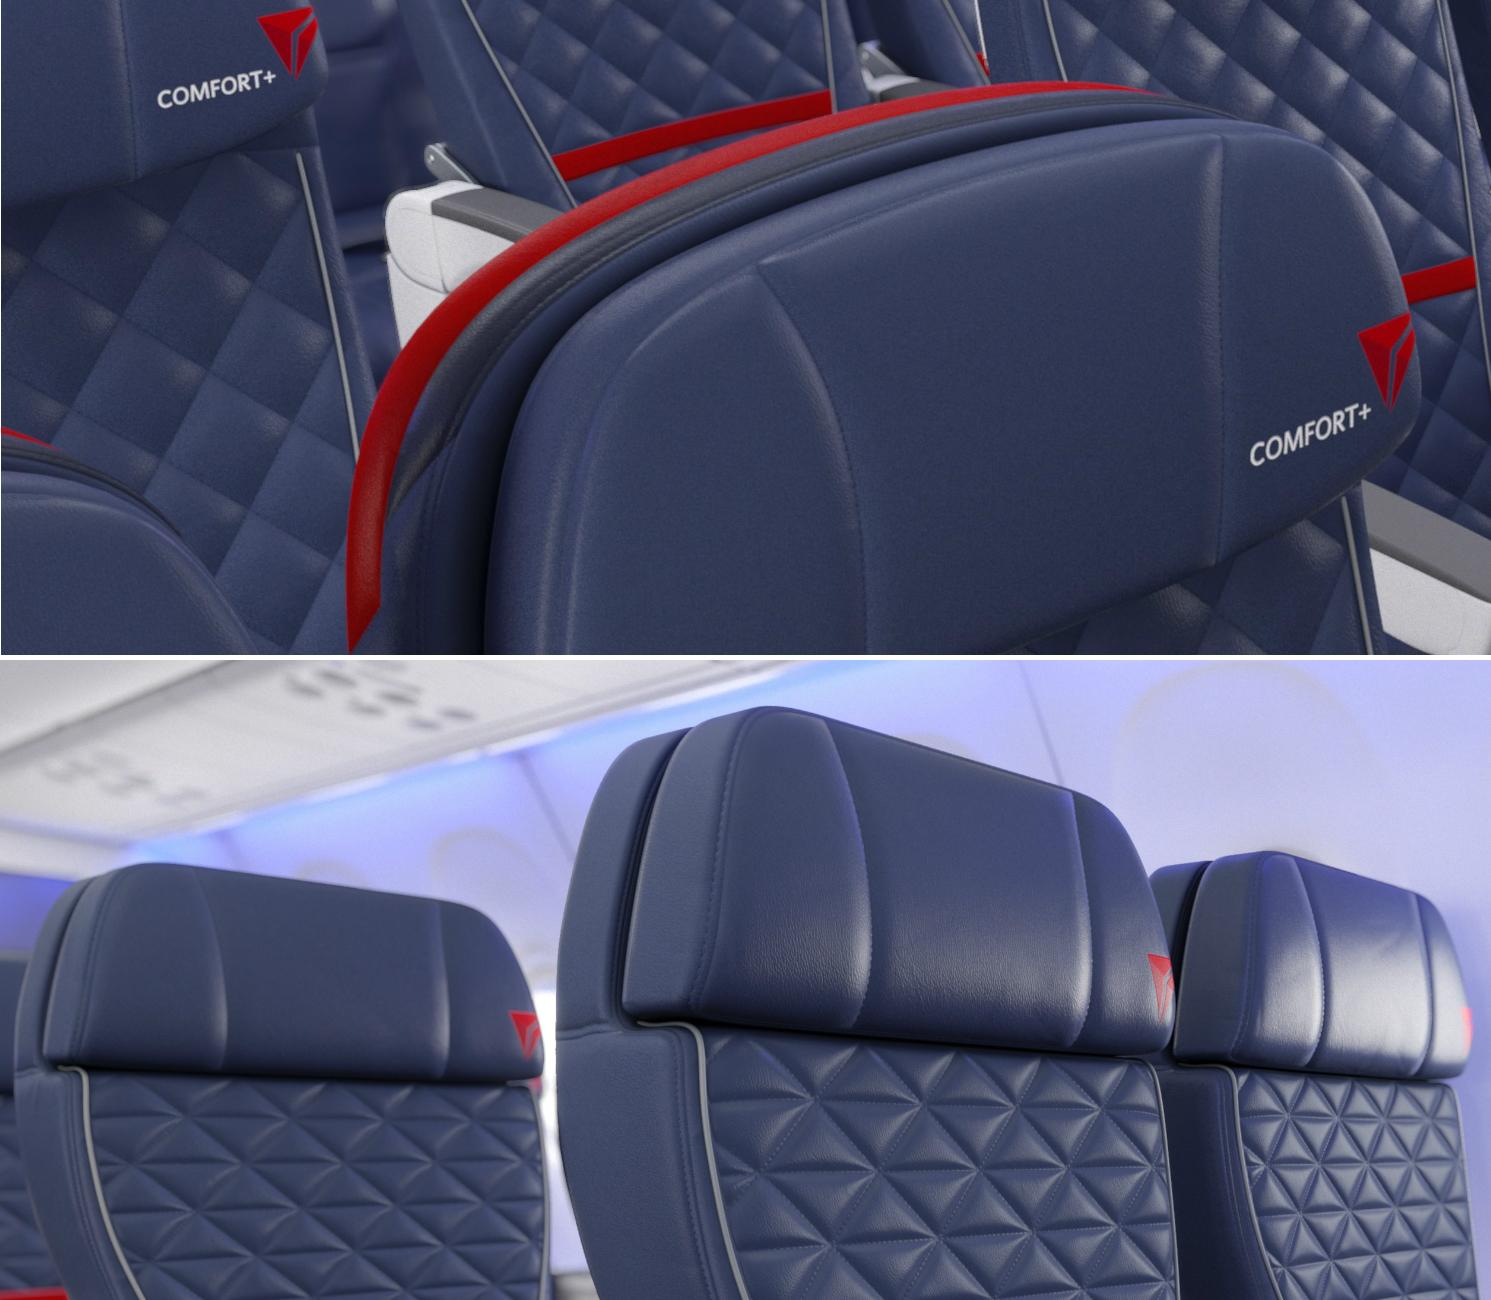 Delta Comfort+ vs First